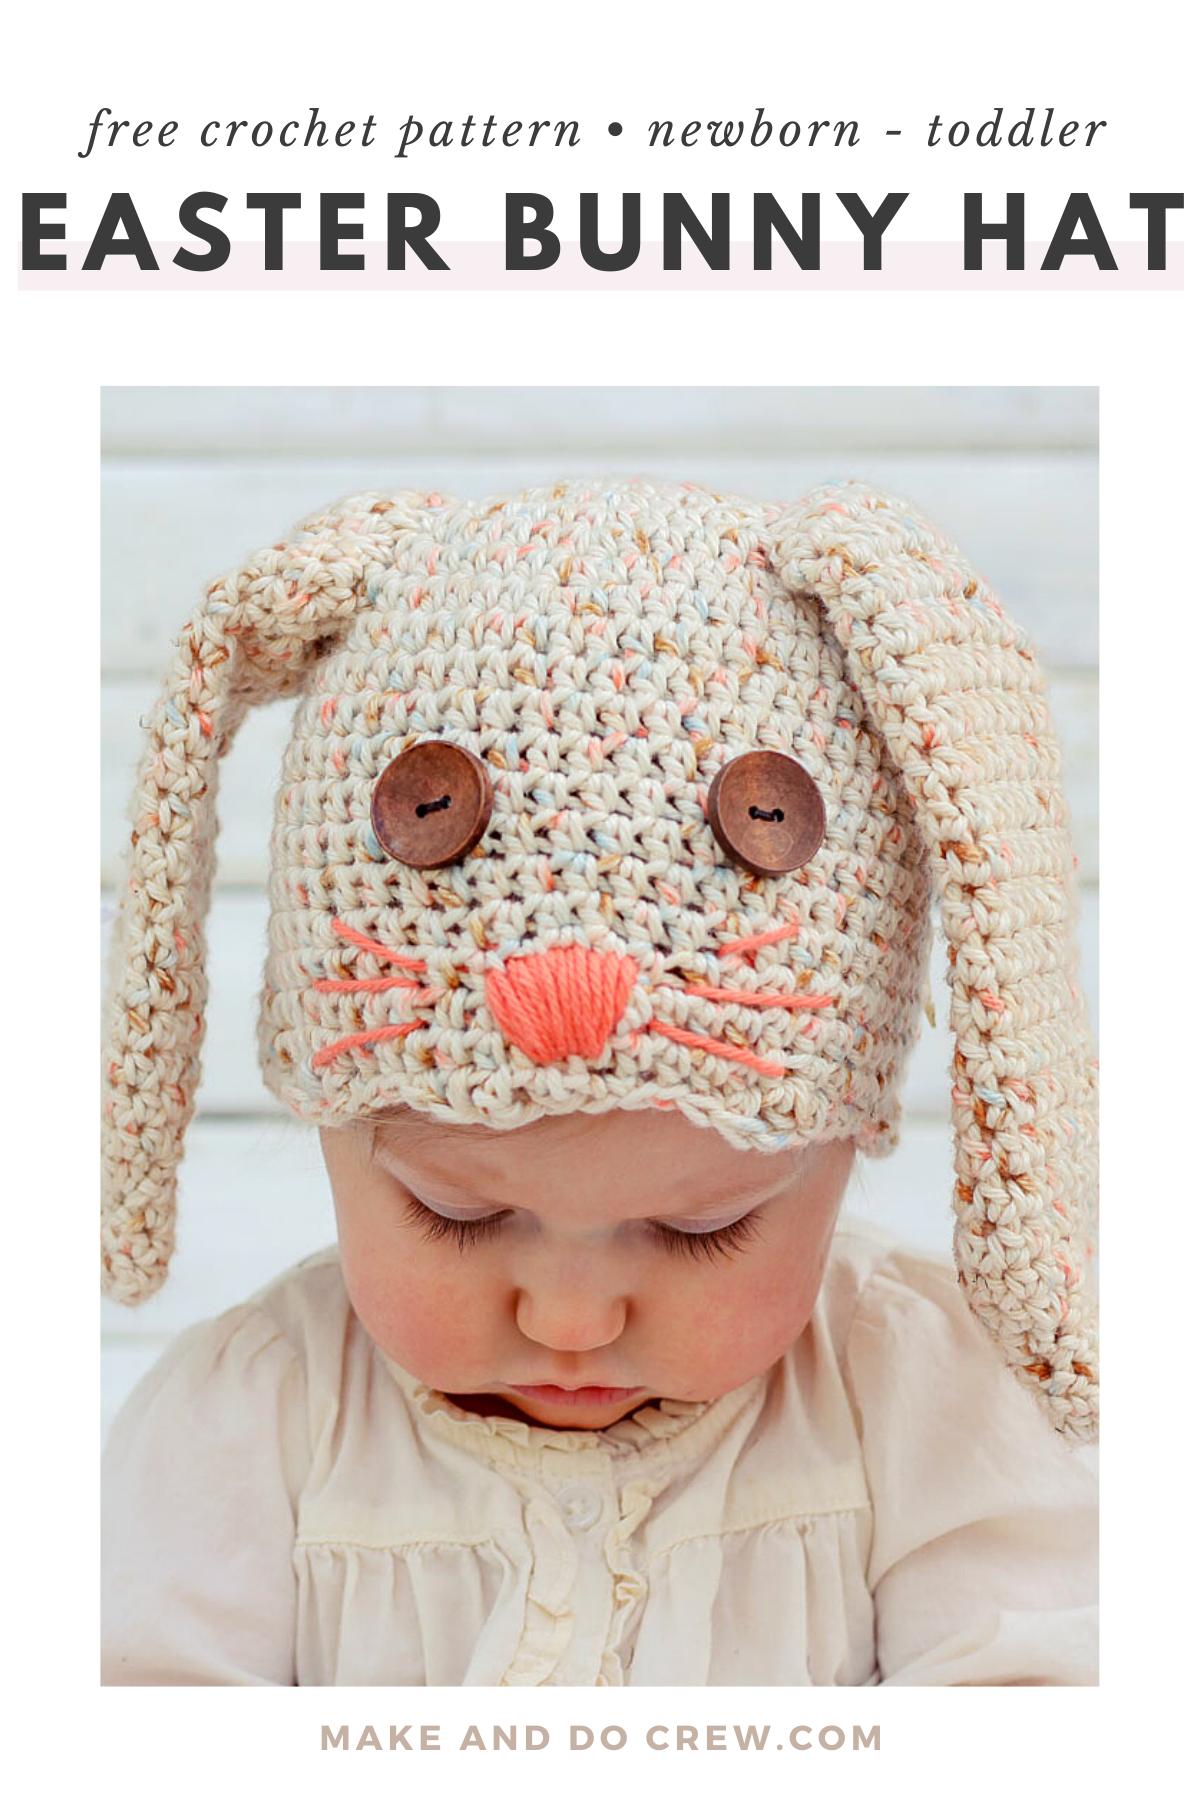 Free Crochet Bunny Hat Pattern Newborn Toddler Make Do Crew In 2020 Newborn Crochet Patterns Crochet Beanie Pattern Crochet Bunny